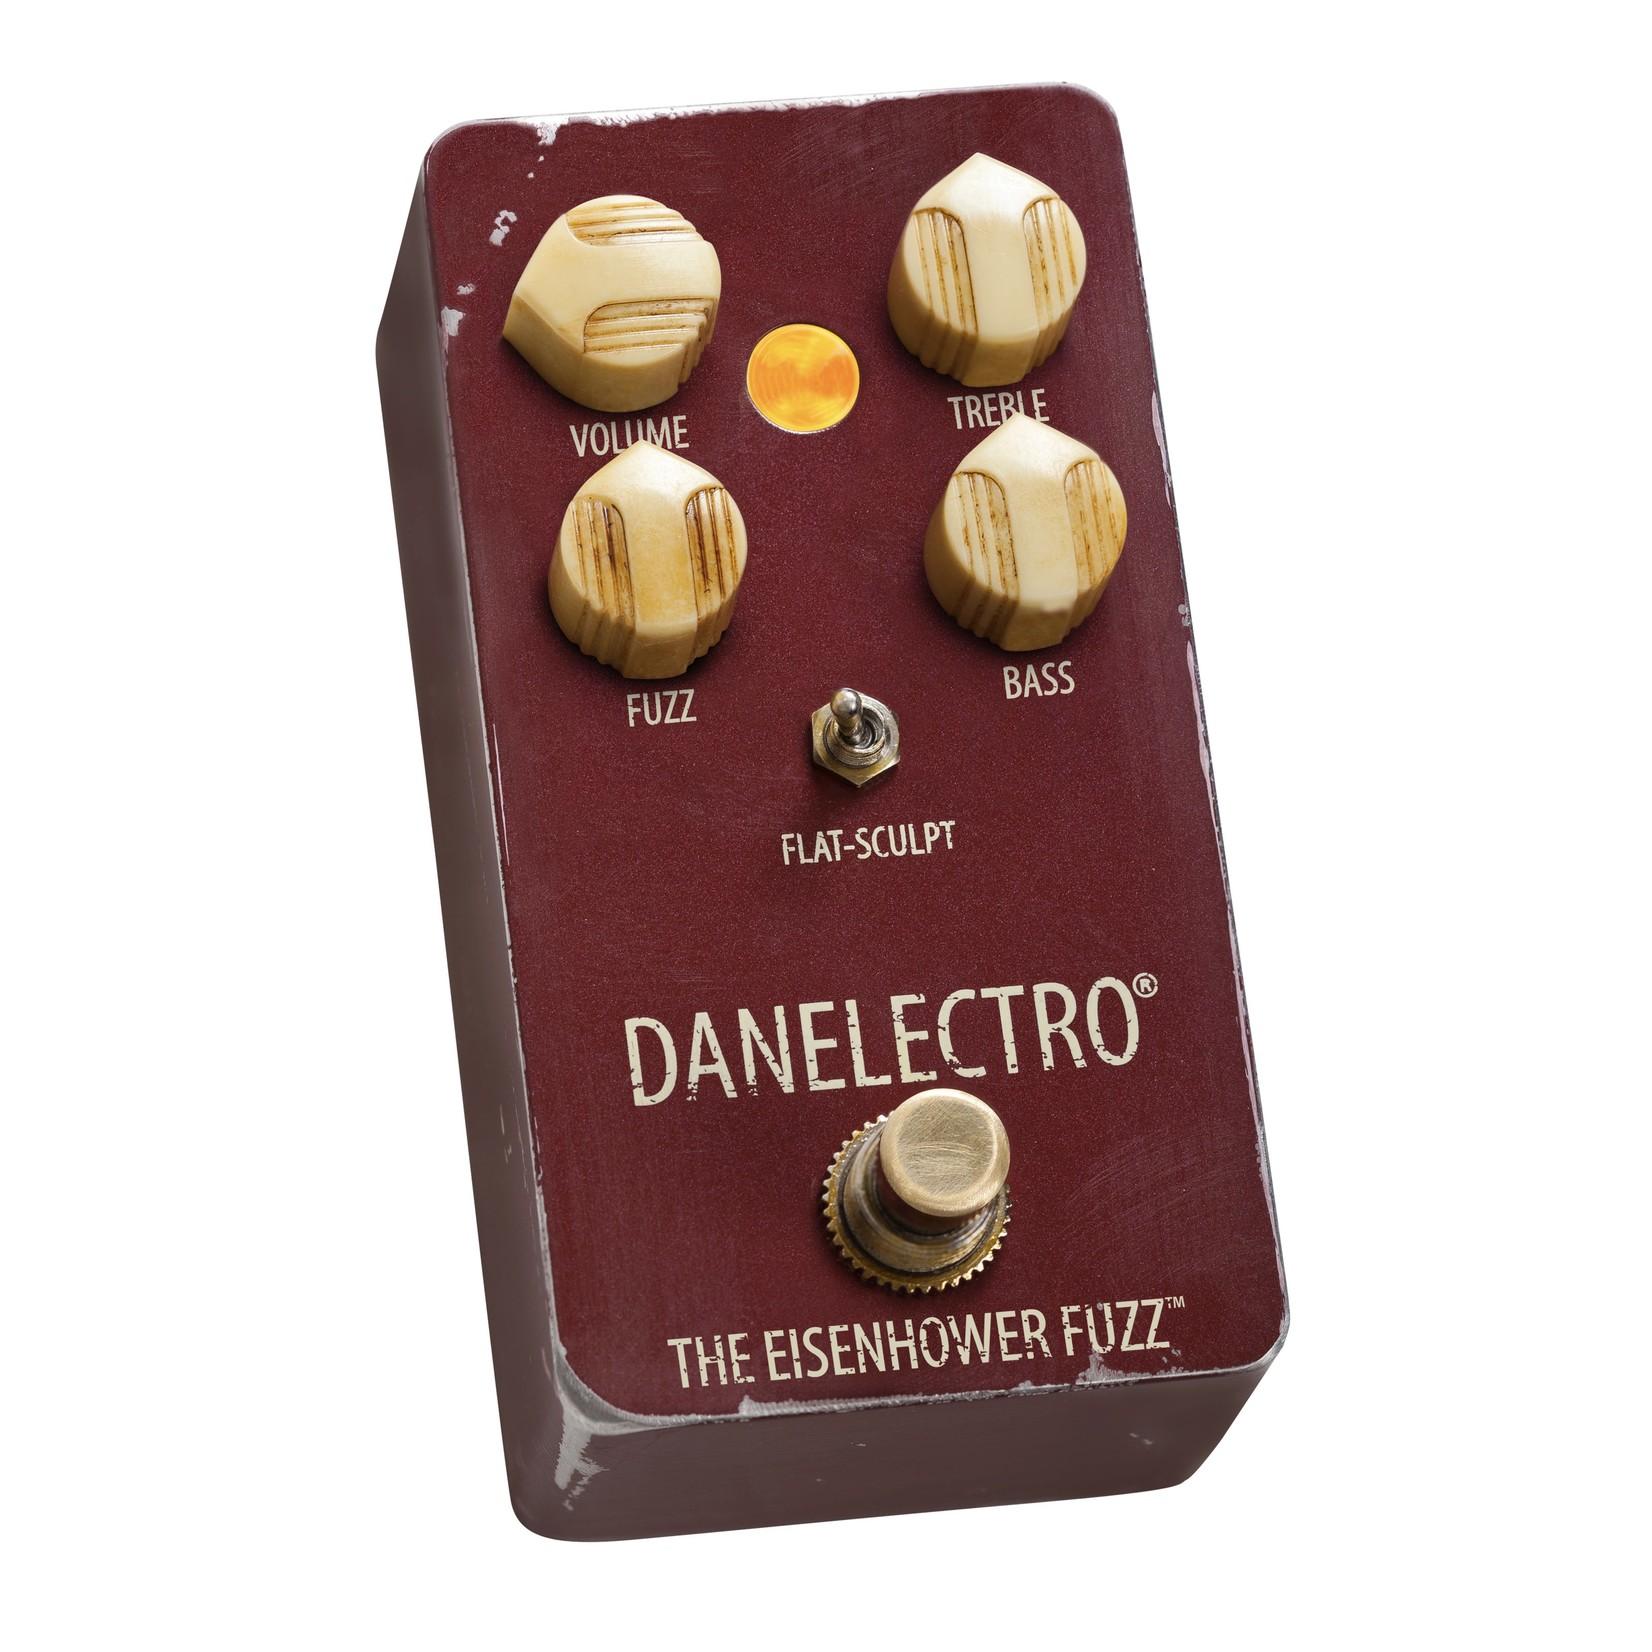 Danelectro Danelectro - The Eisenhower Fuzz Pedal with Octave Effect